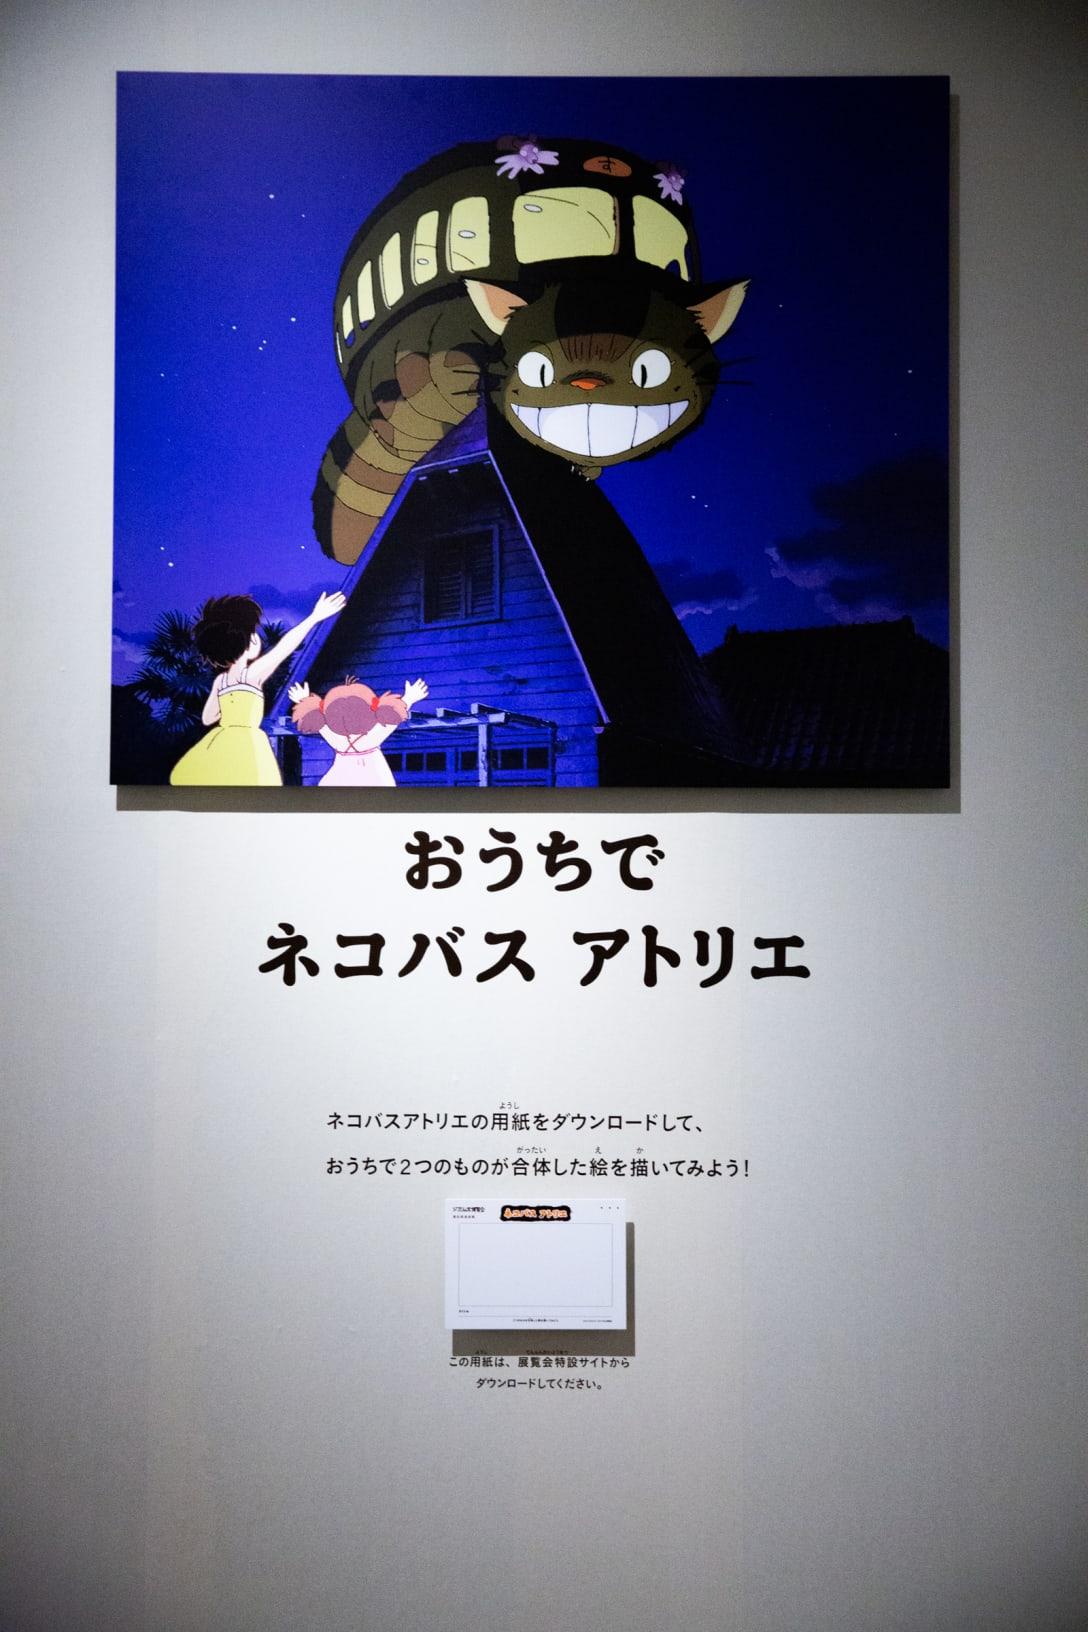 ©︎ Studio Ghibli